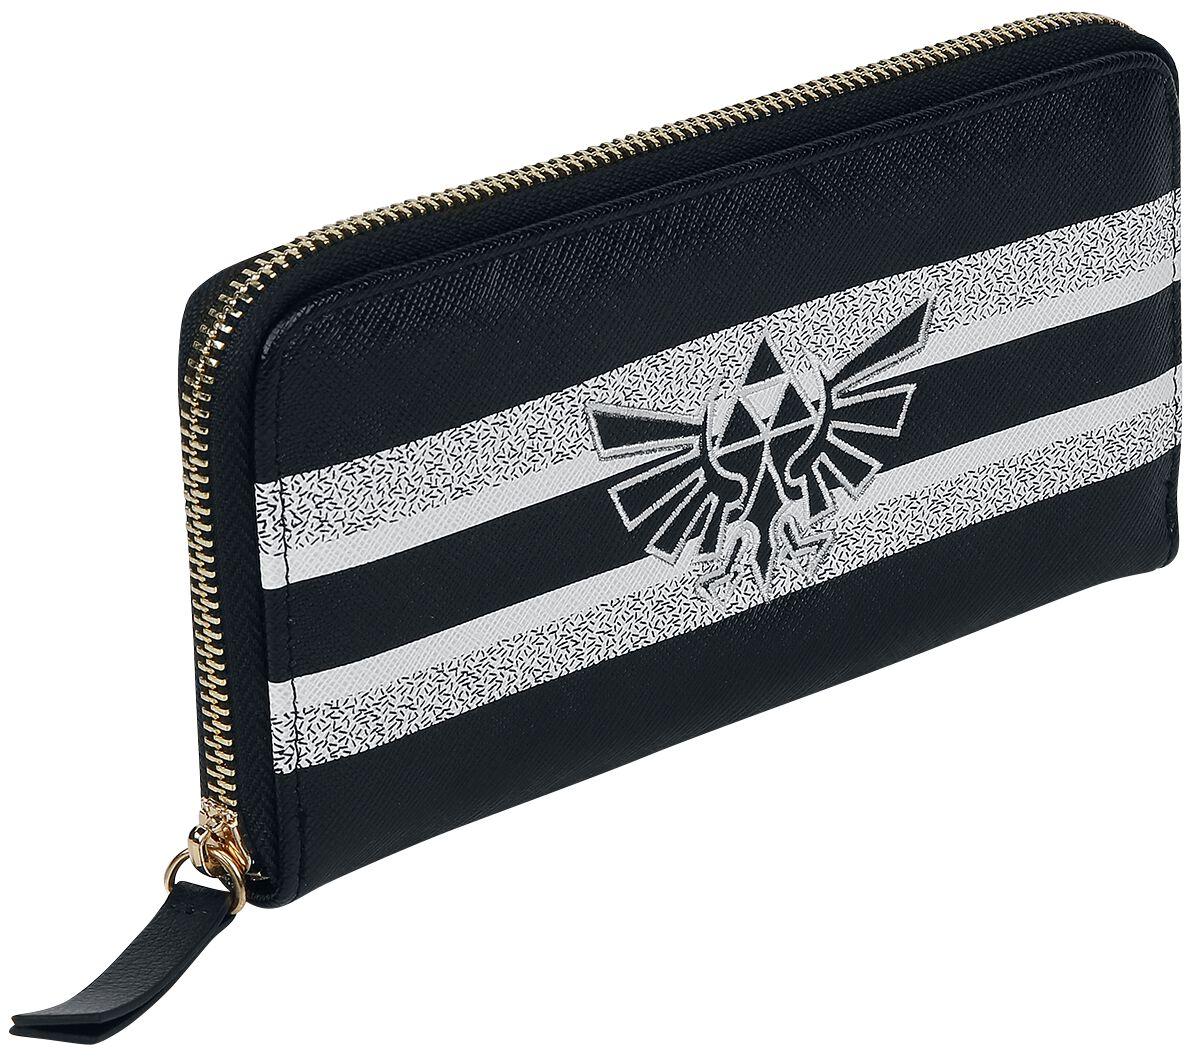 The Legend Of Zelda Triforce Geldbörse schwarz weiß GW016070ZEL